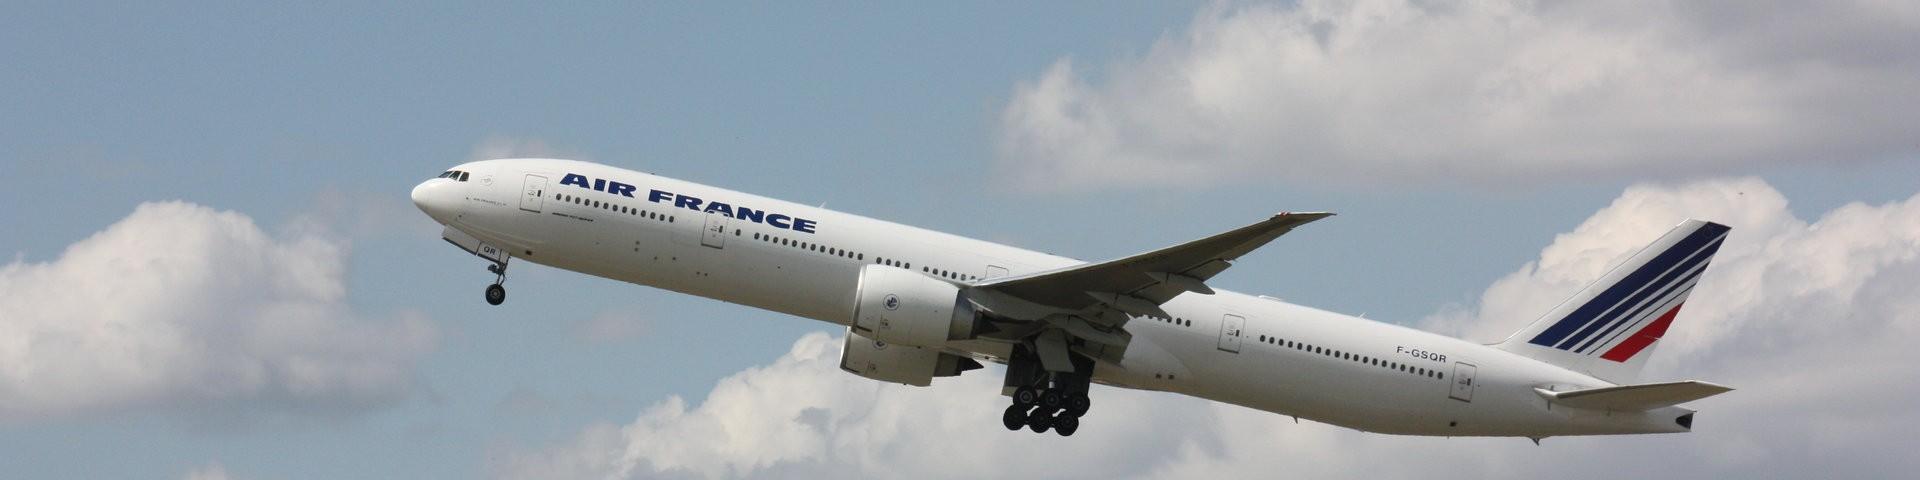 rsz_boeing_777-300er_air_france